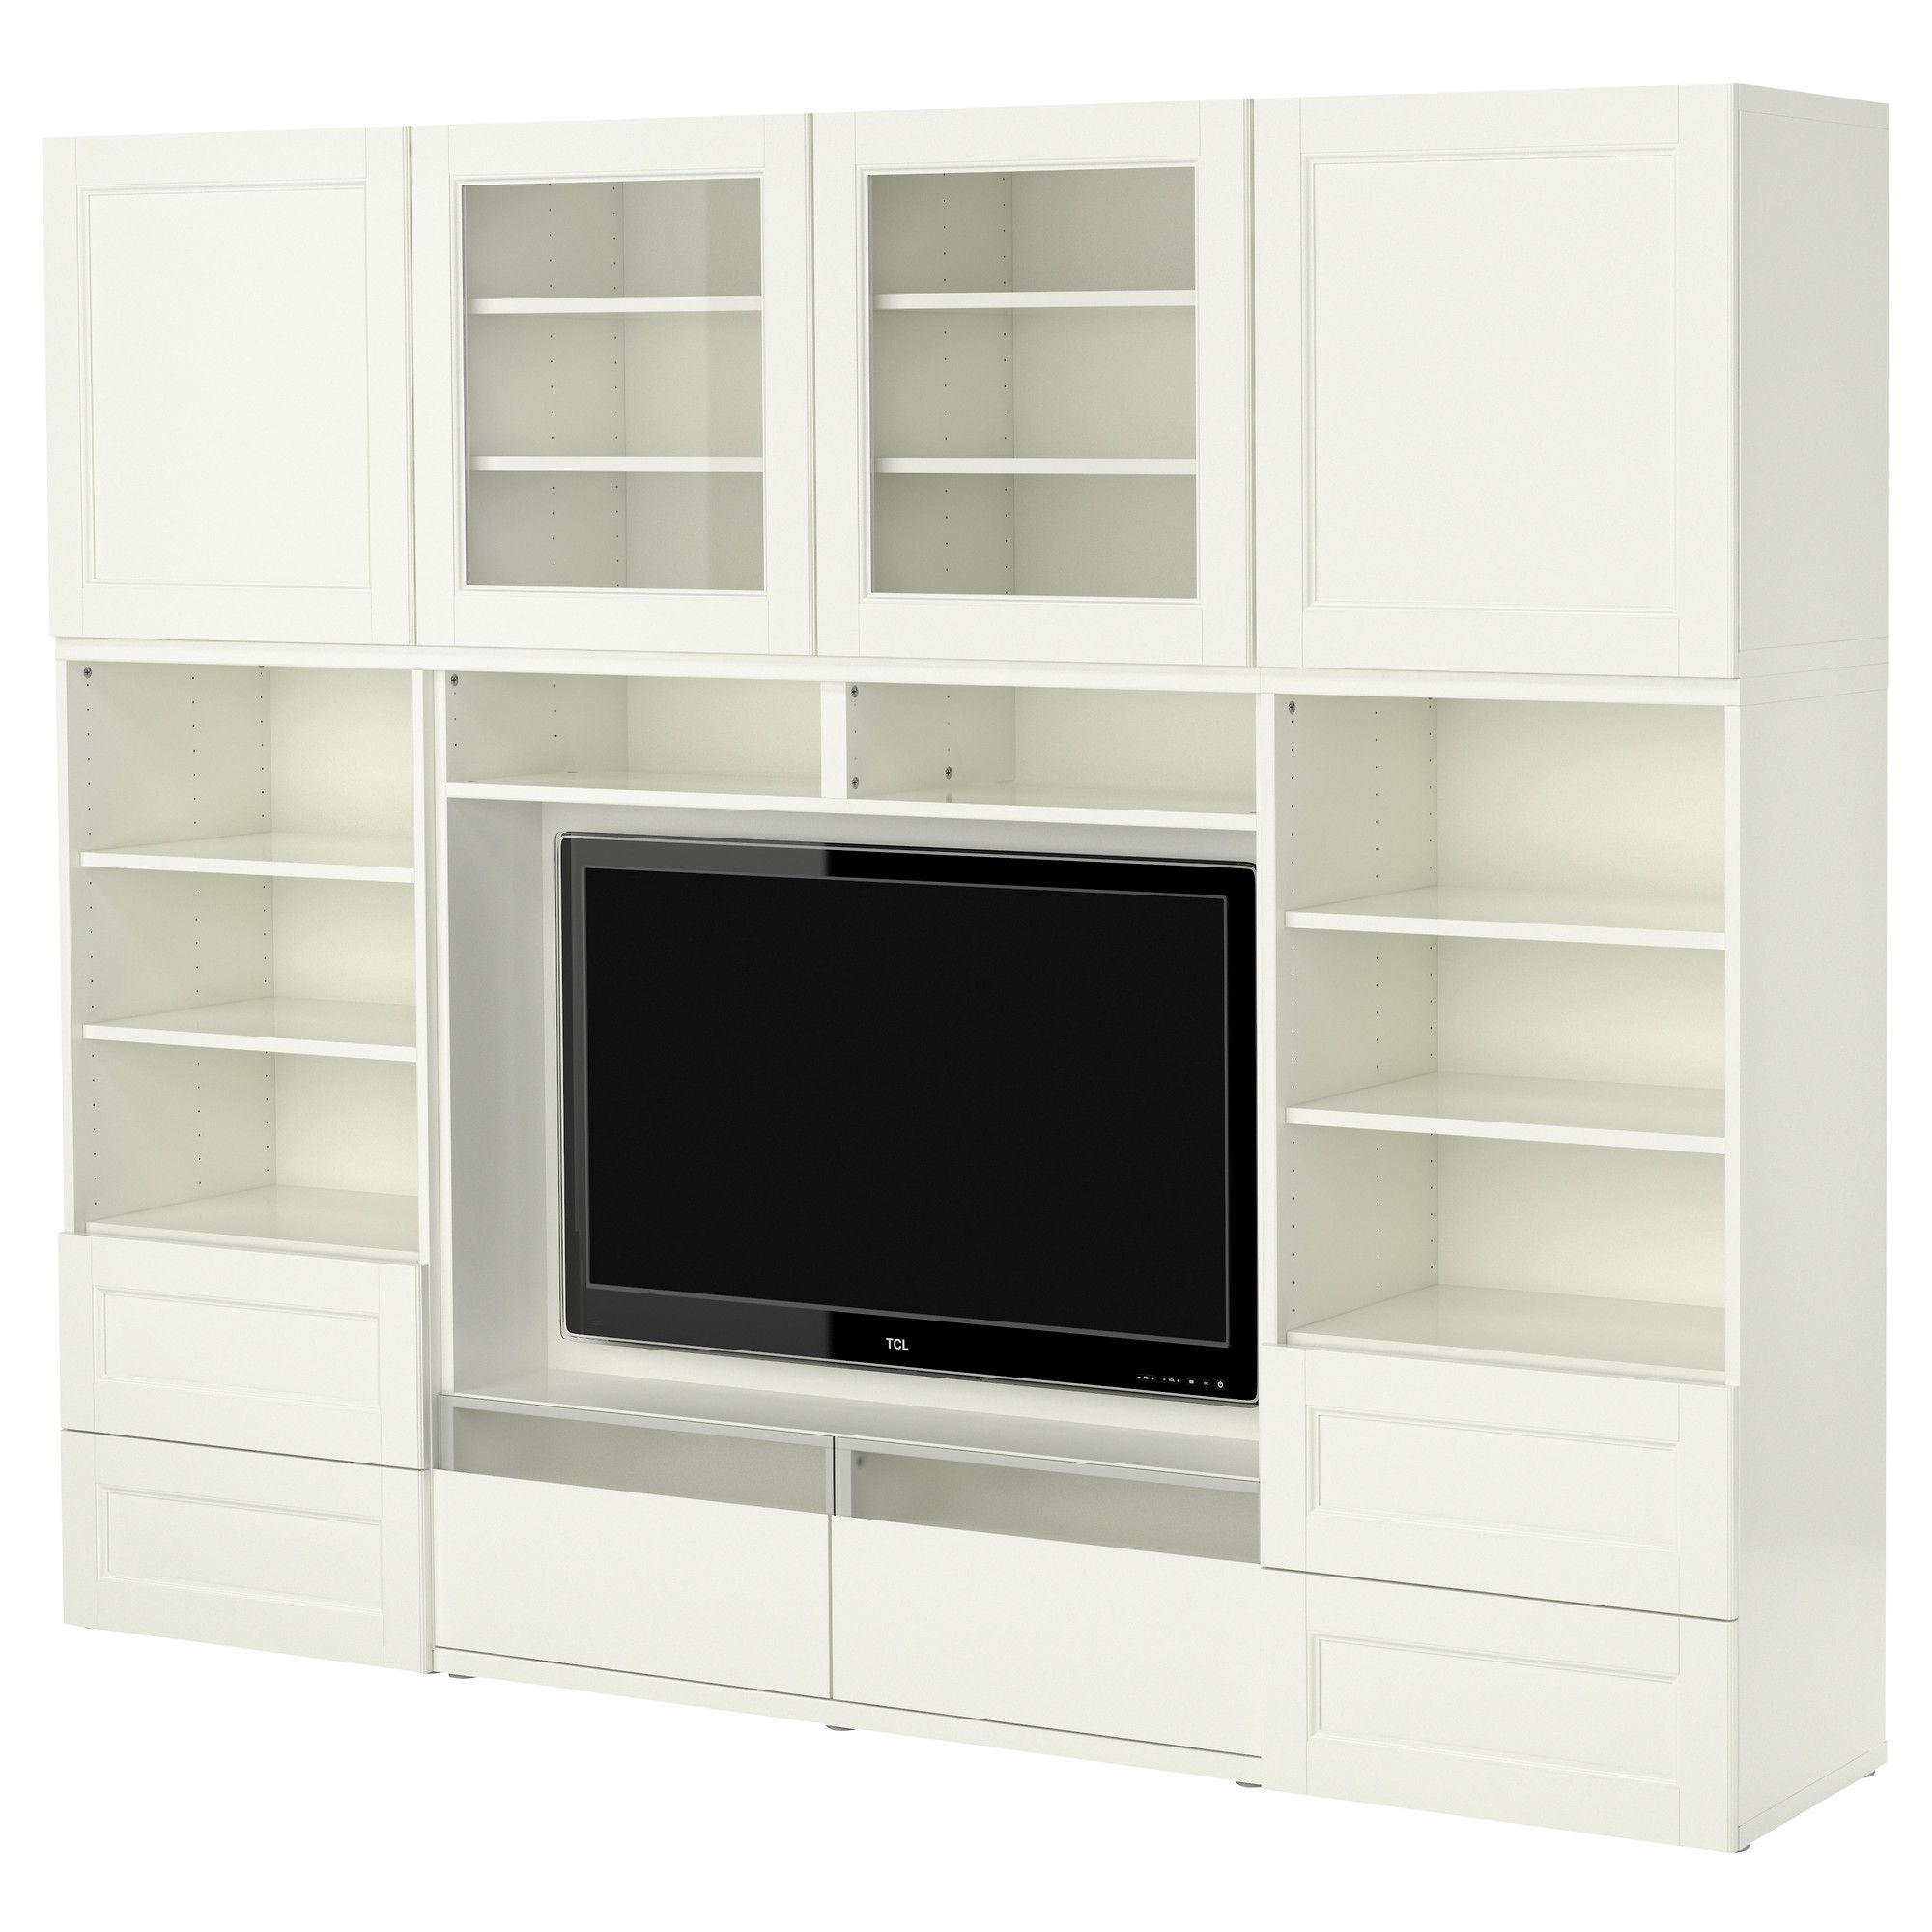 Best combinaison tv rangement living room pinterest combinaisons tv et rangement - Mueble para tocadiscos ikea ...